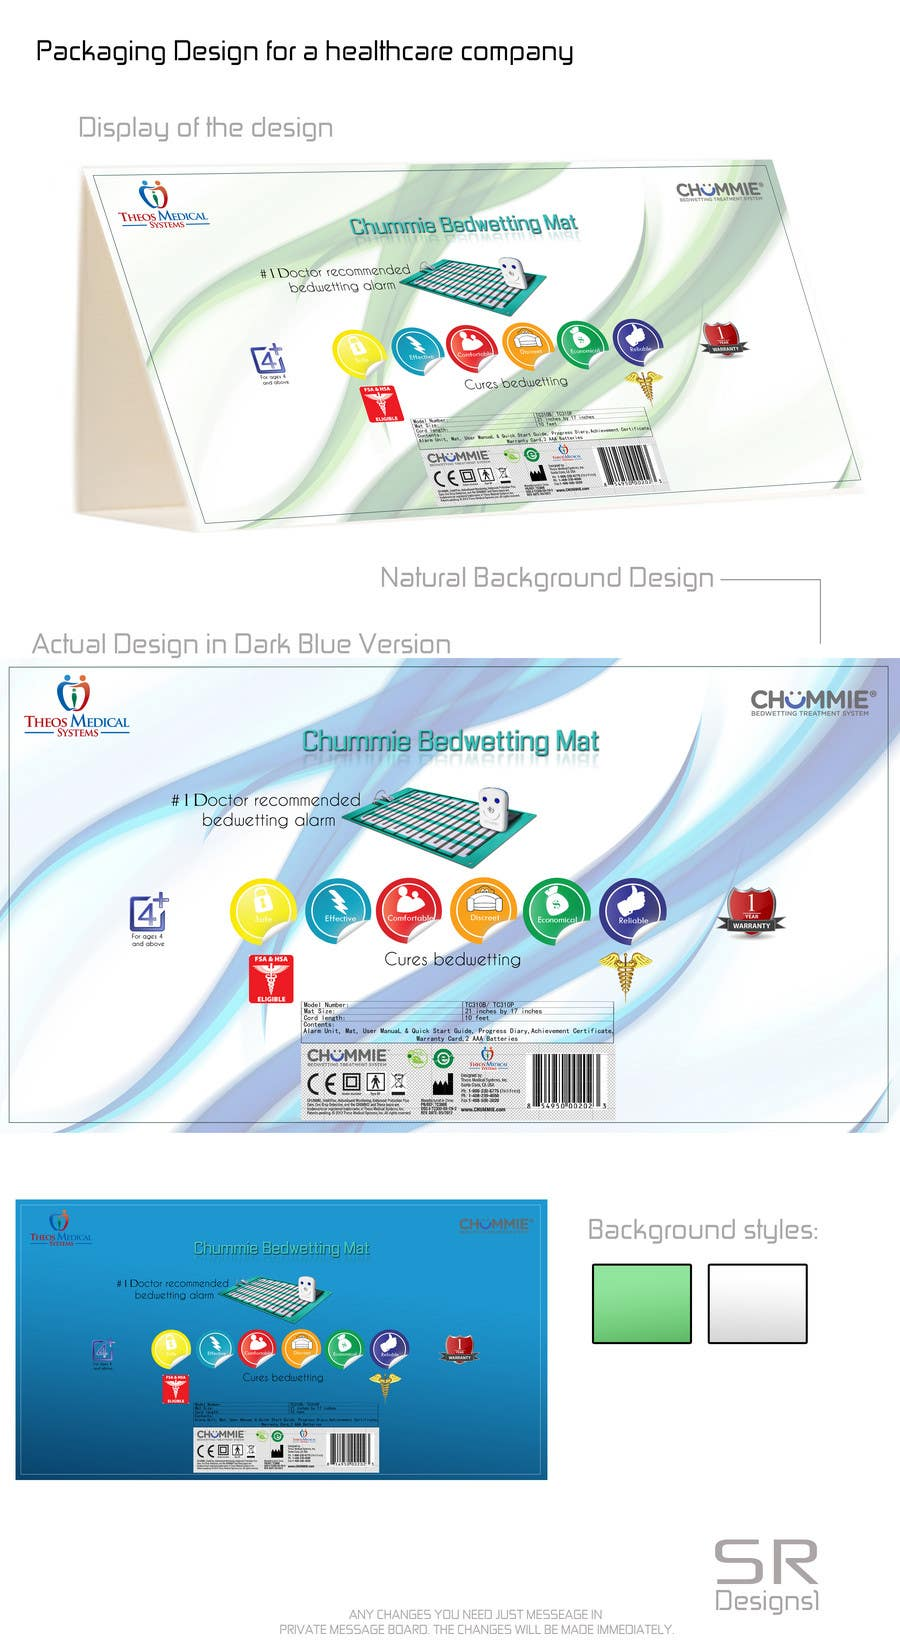 Konkurrenceindlæg #                                        17                                      for                                         Packaging Design for a healthcare company